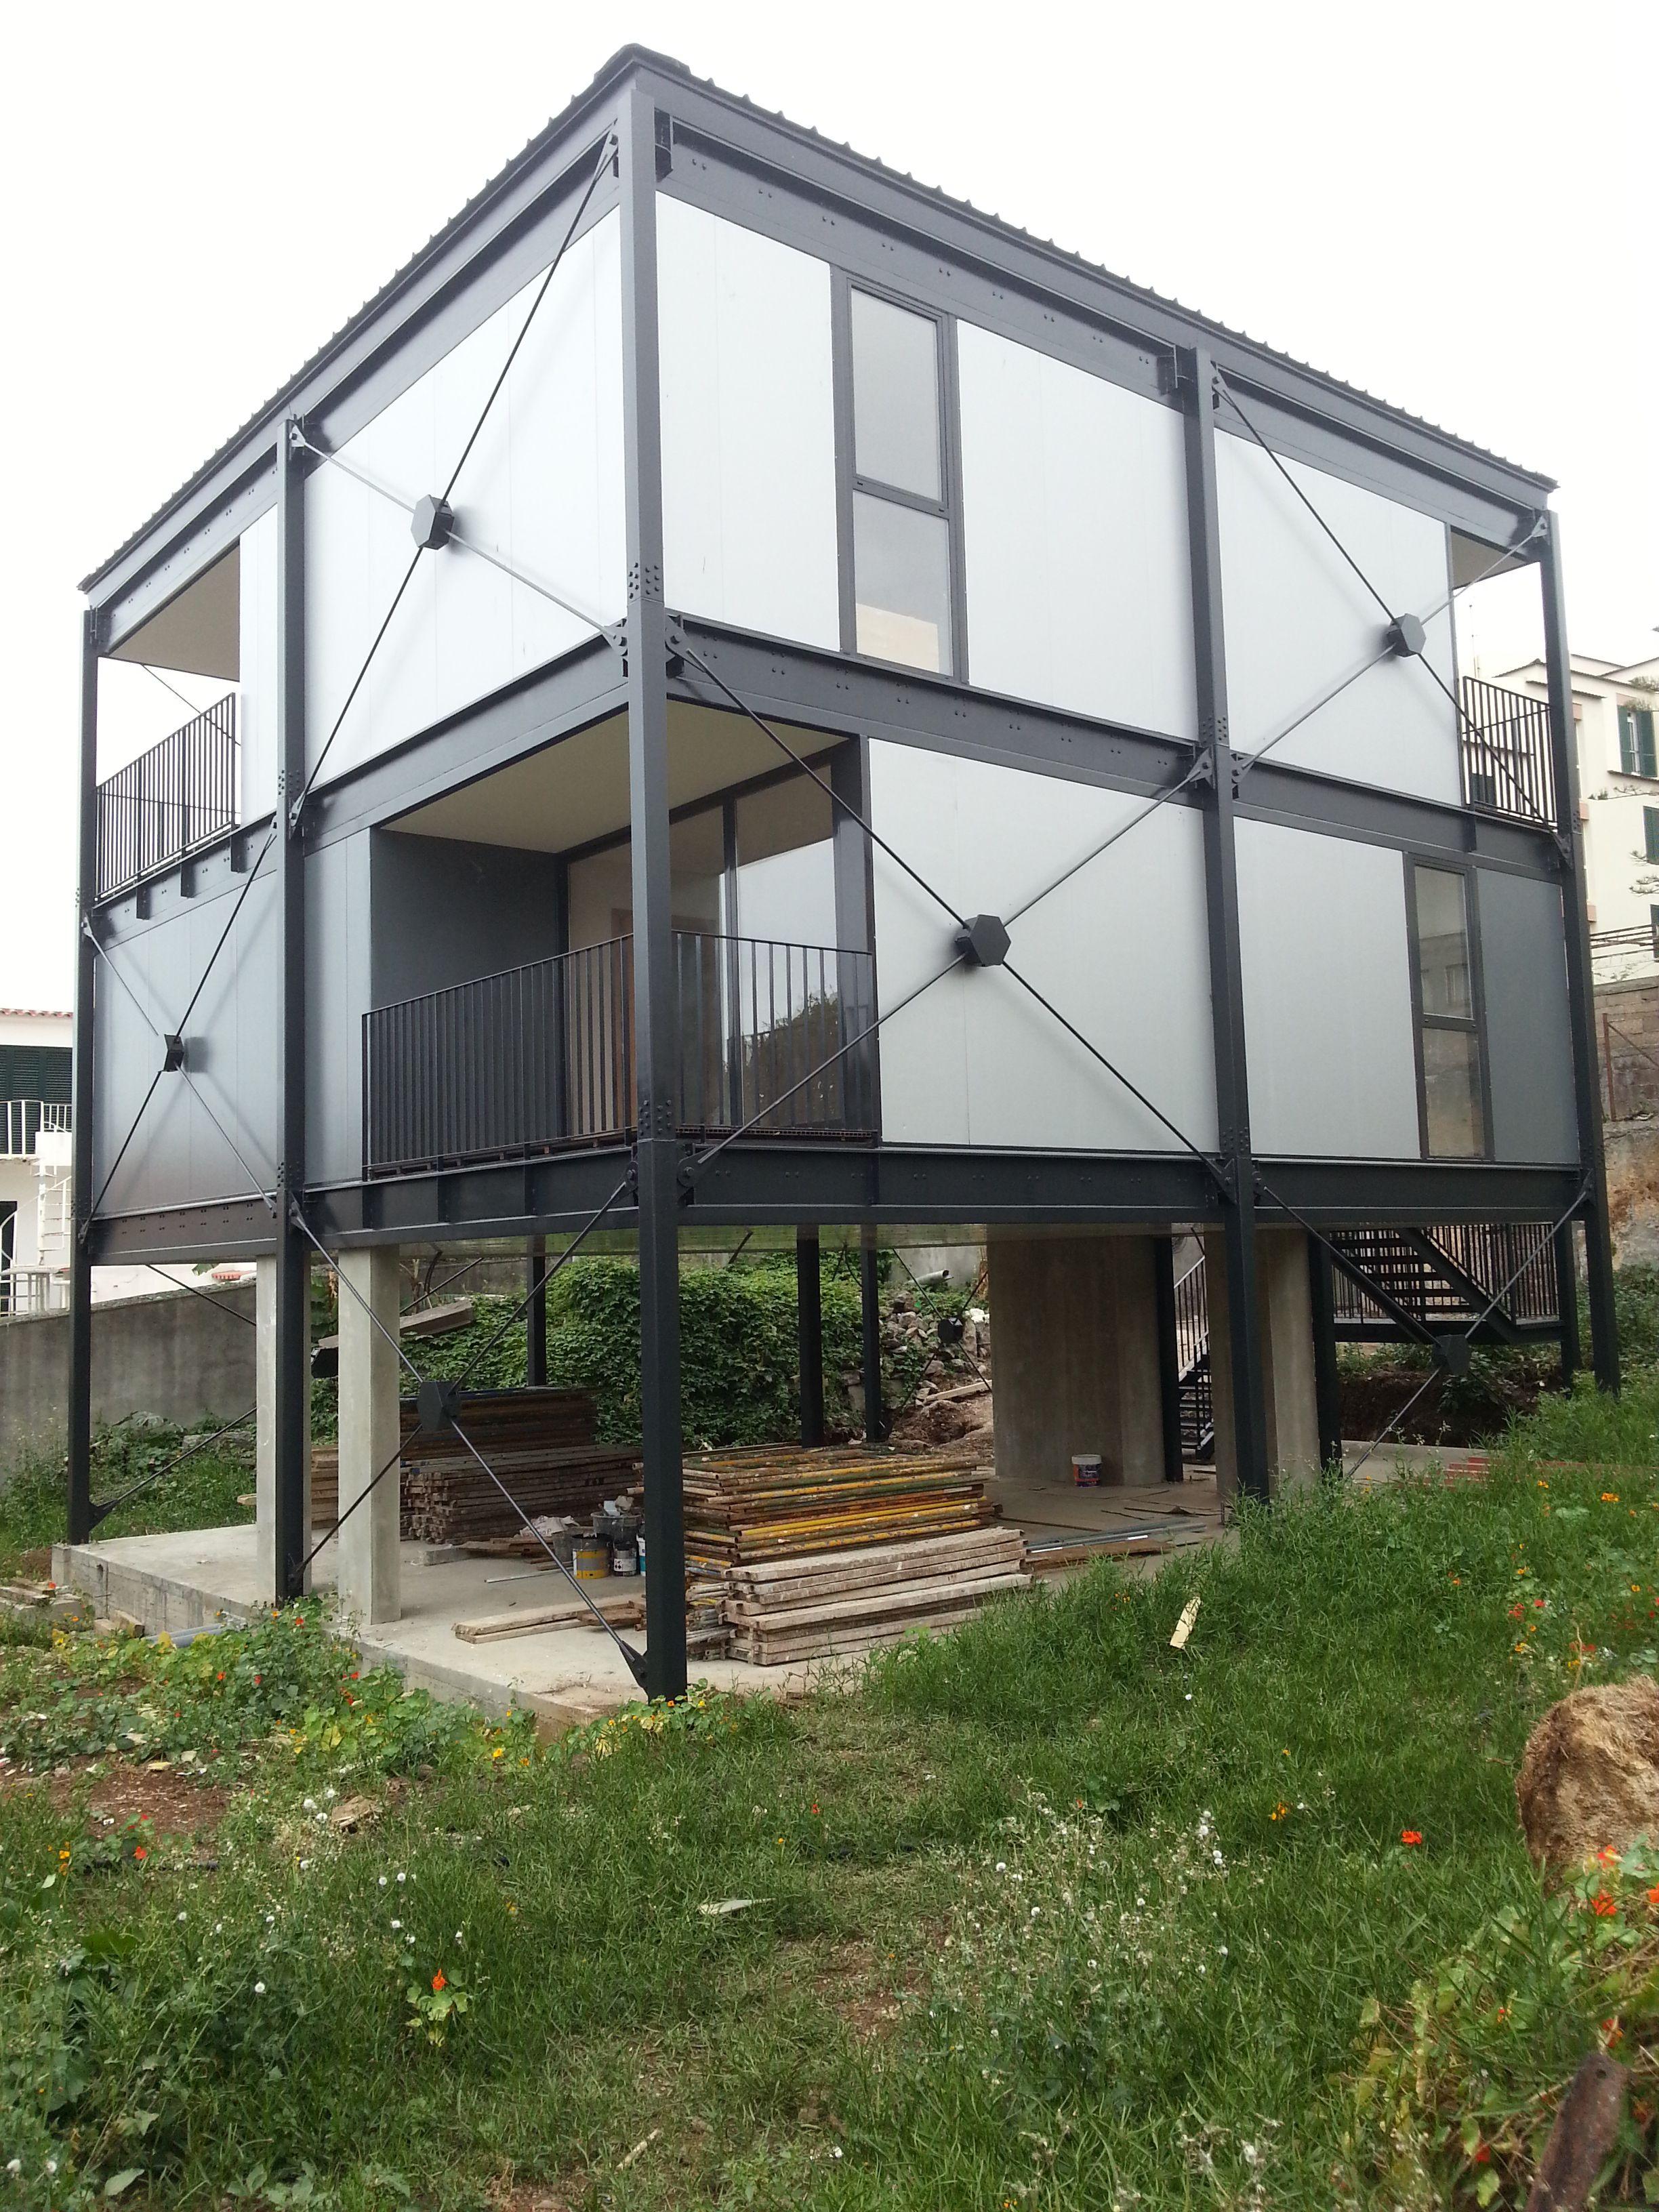 Prot tipo architecture in 2019 steel house - Estructura metalicas para casas ...